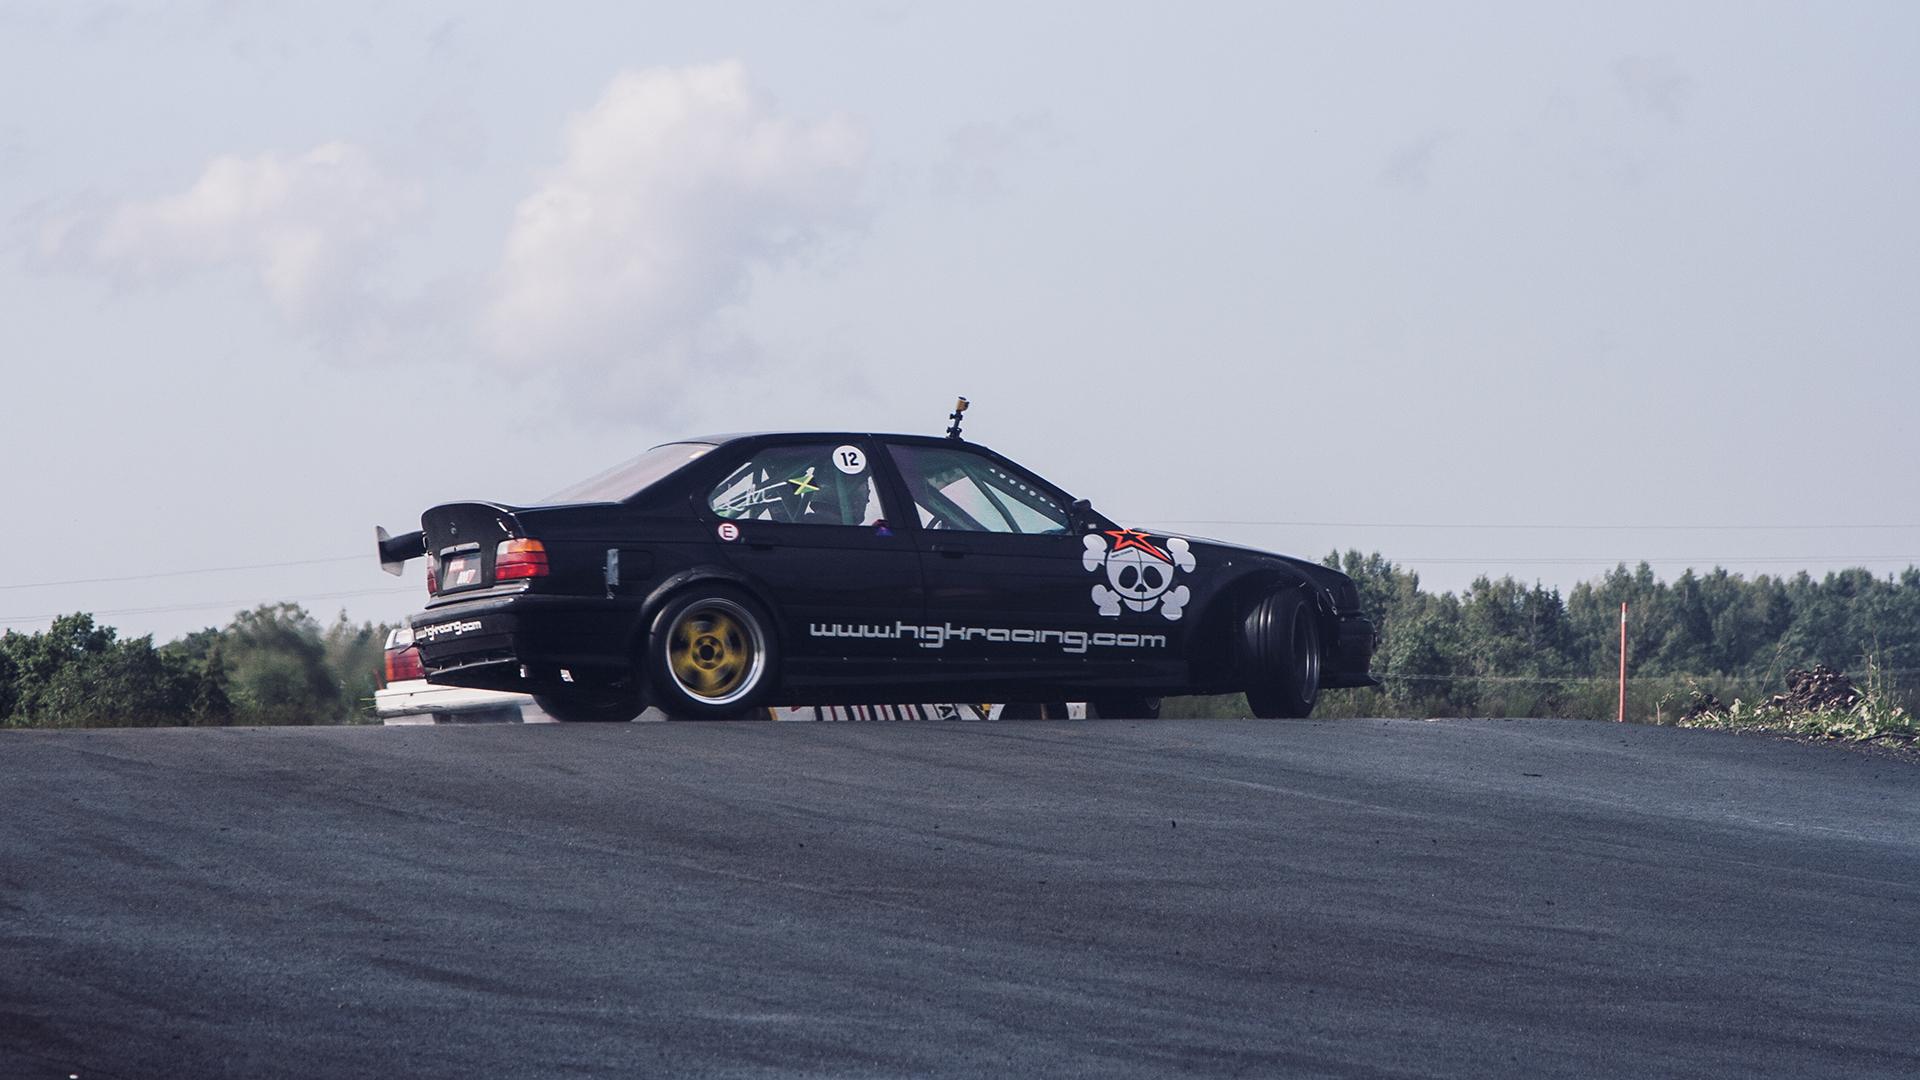 10-years-of-drifting-in-estonia-2012-by-wheelsbywovka-3